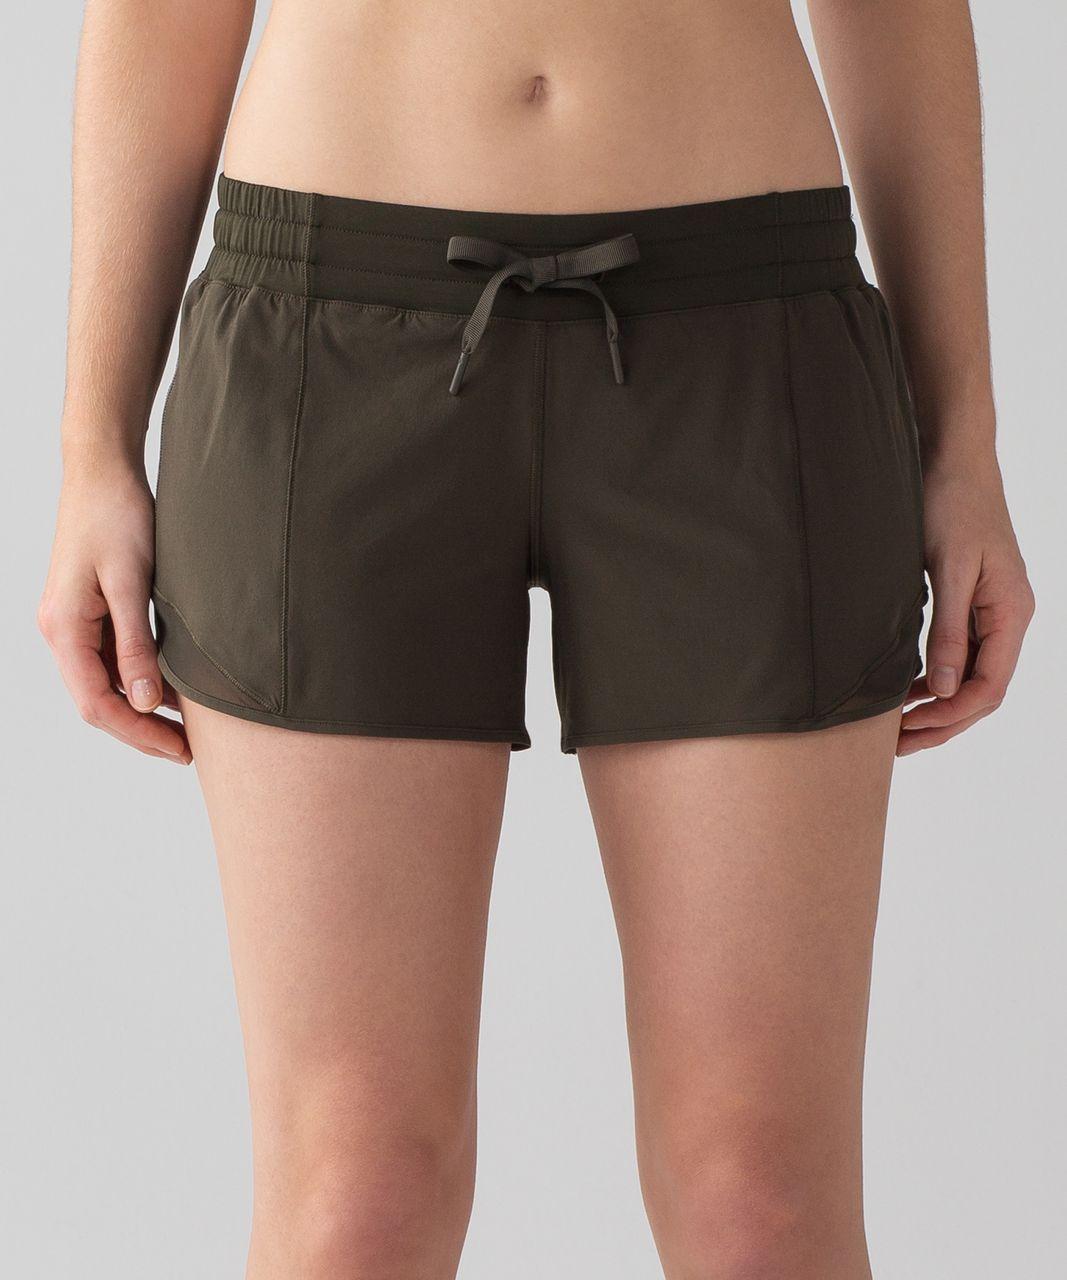 "Lululemon Hotty Hot Short (Long 4"") - Dark Olive"